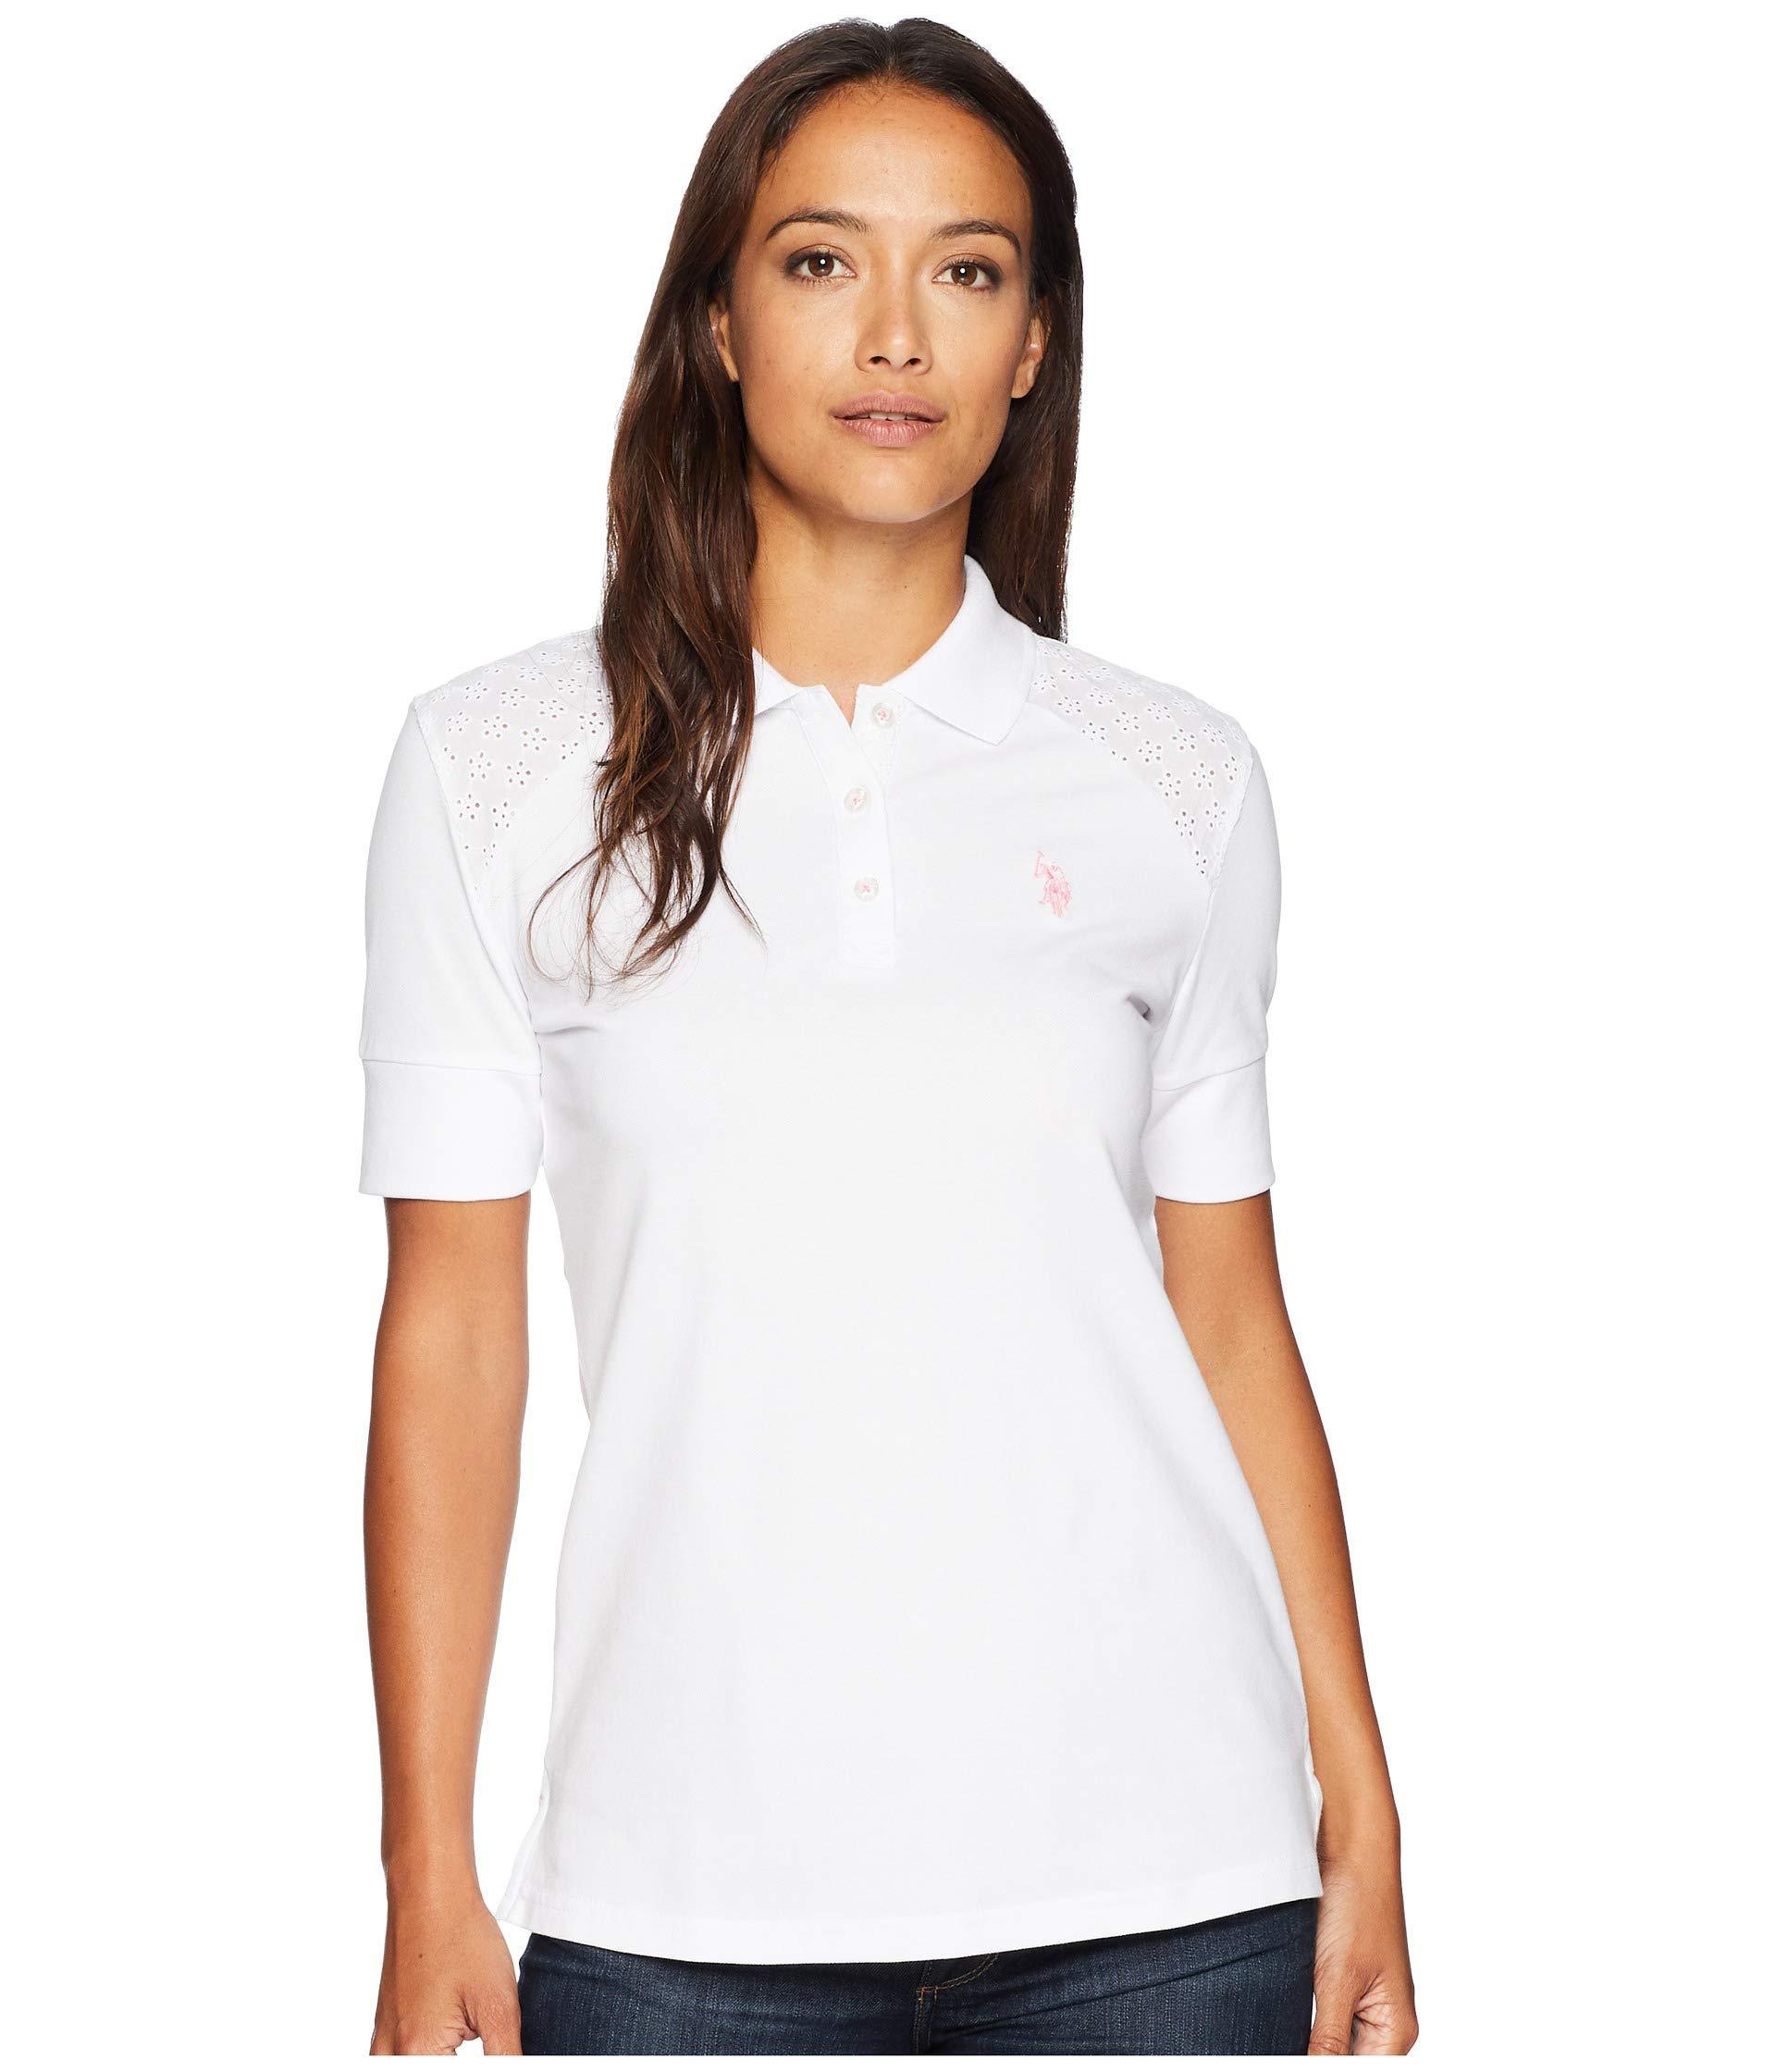 3fbf5527116fa U.S. POLO ASSN. Women s White Short Sleeve Lace Yoke Solid Stretch Pique Polo  Shirt